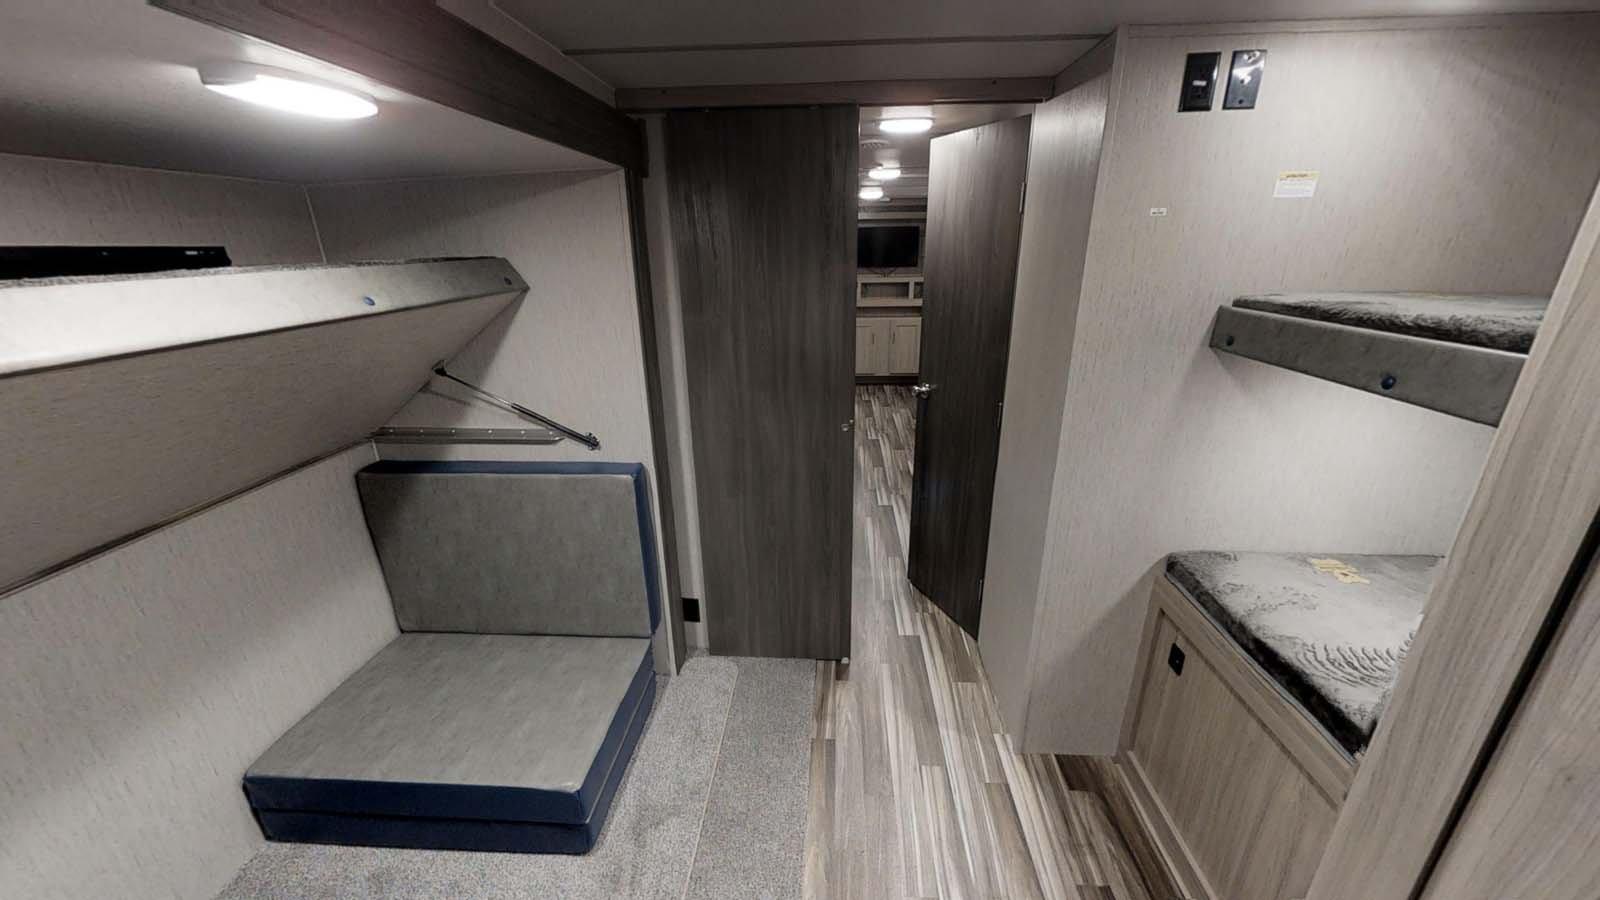 coachmen freedom express interior bunkhouse